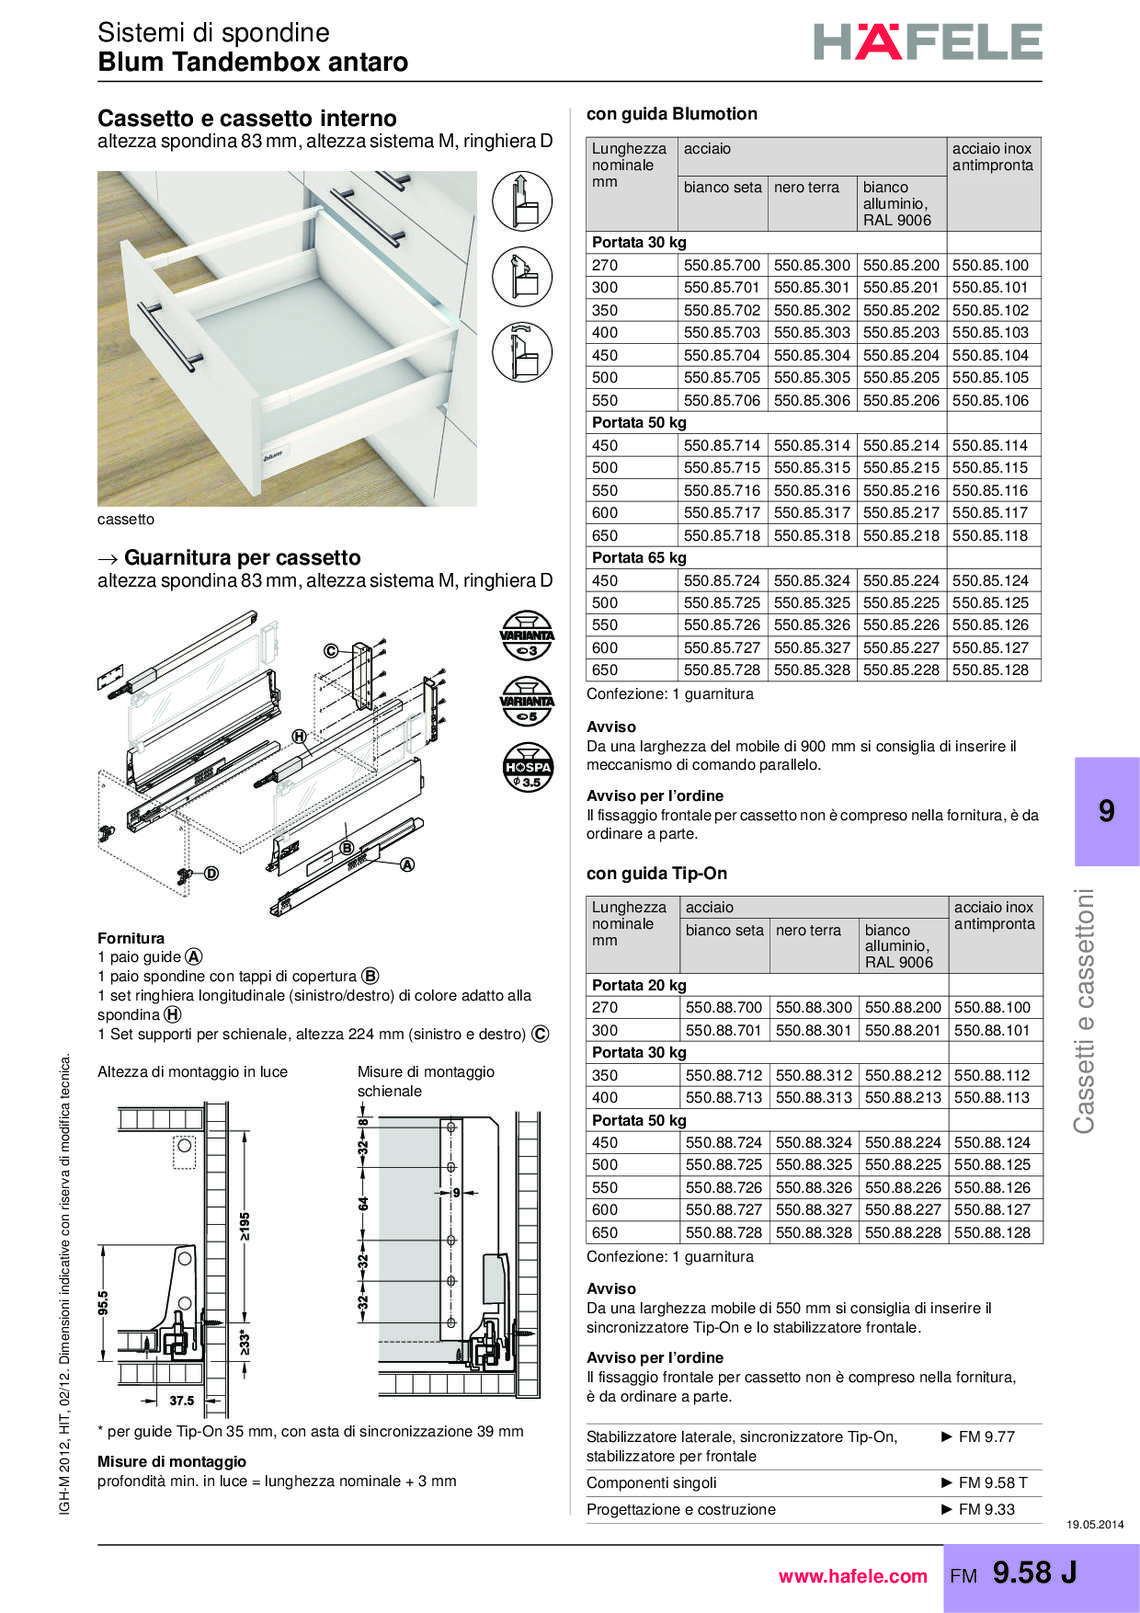 hafele-spondine-e-guide-per-mobili_40_084.jpg